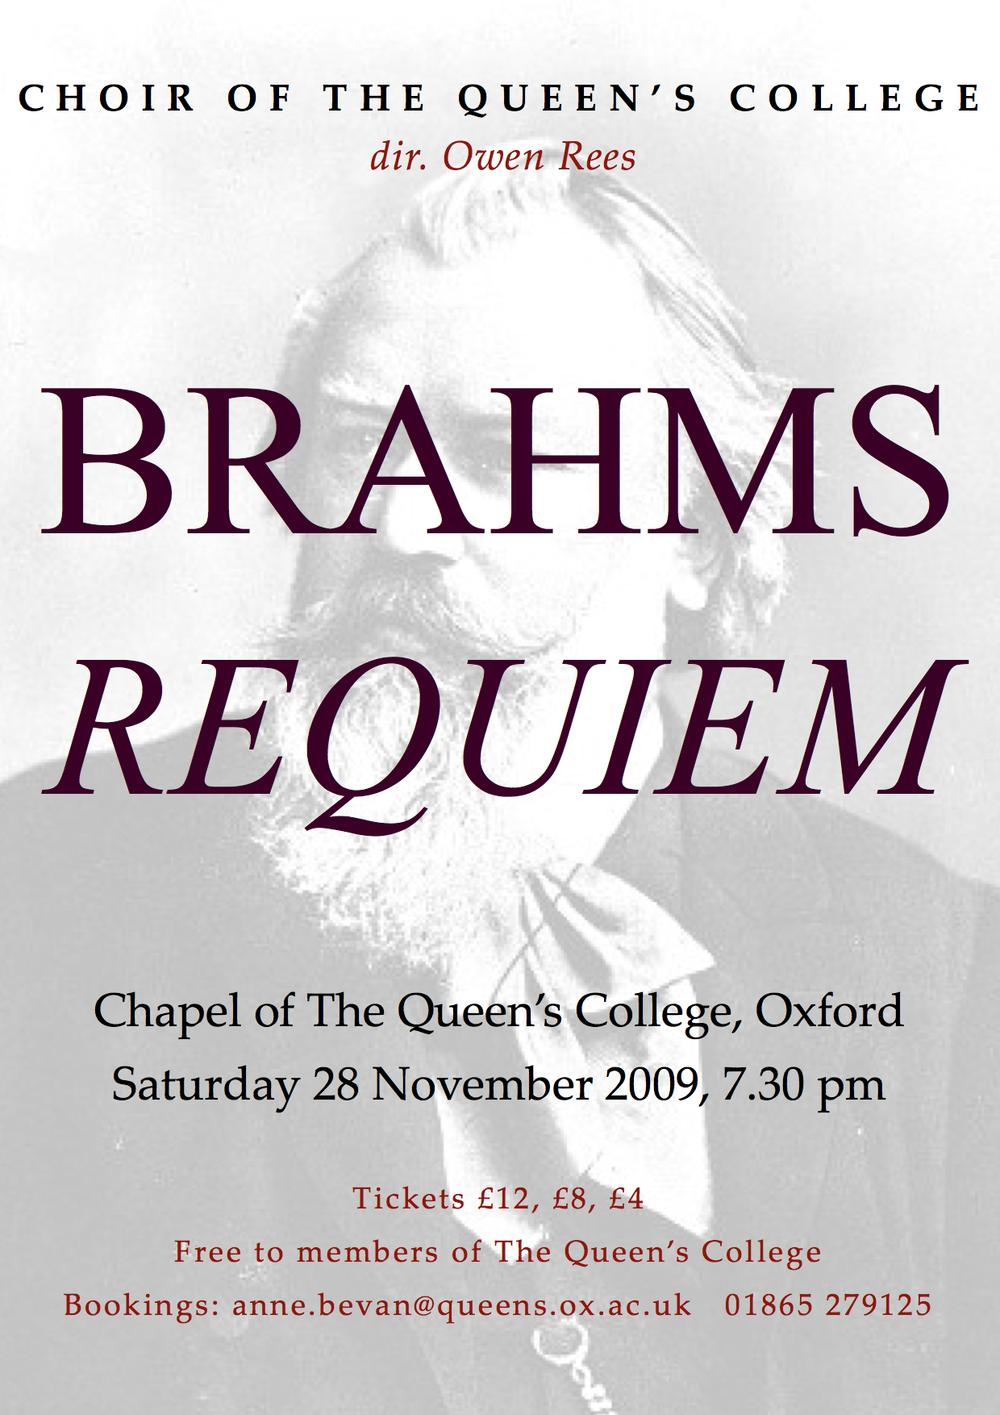 Brahms poster.jpg